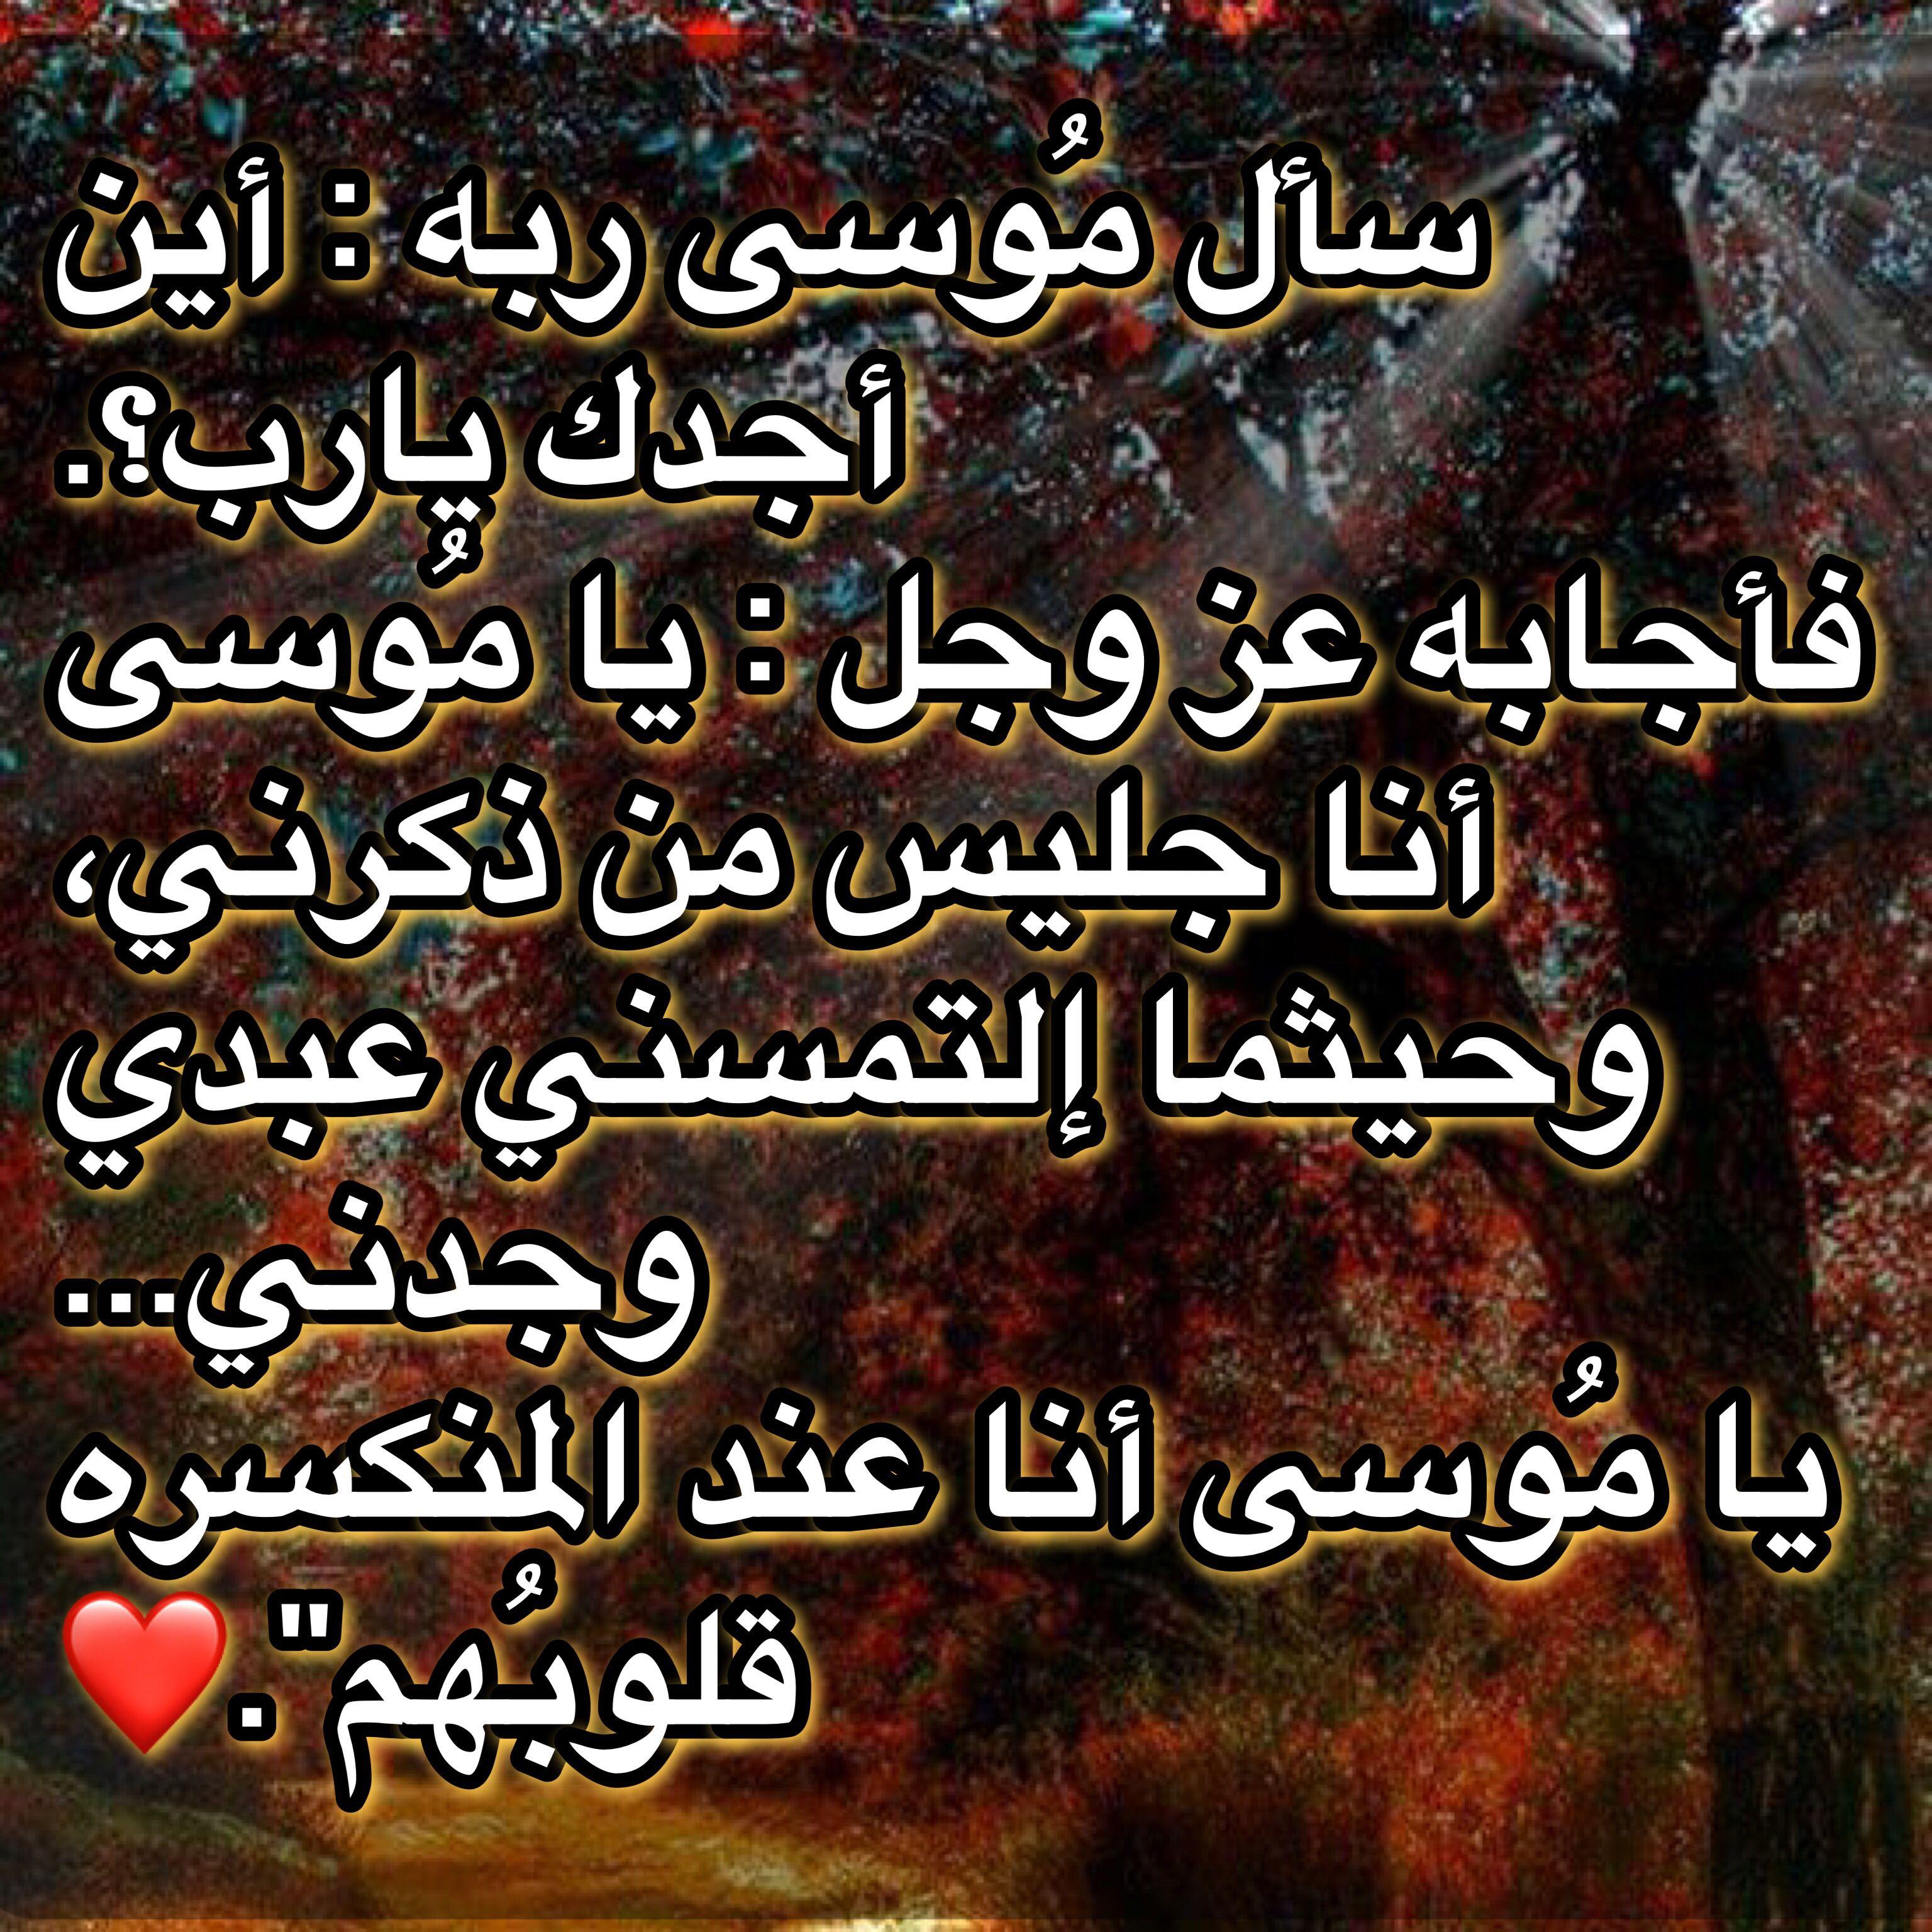 سأل موسى ربه Arabic Calligraphy Quran Calligraphy